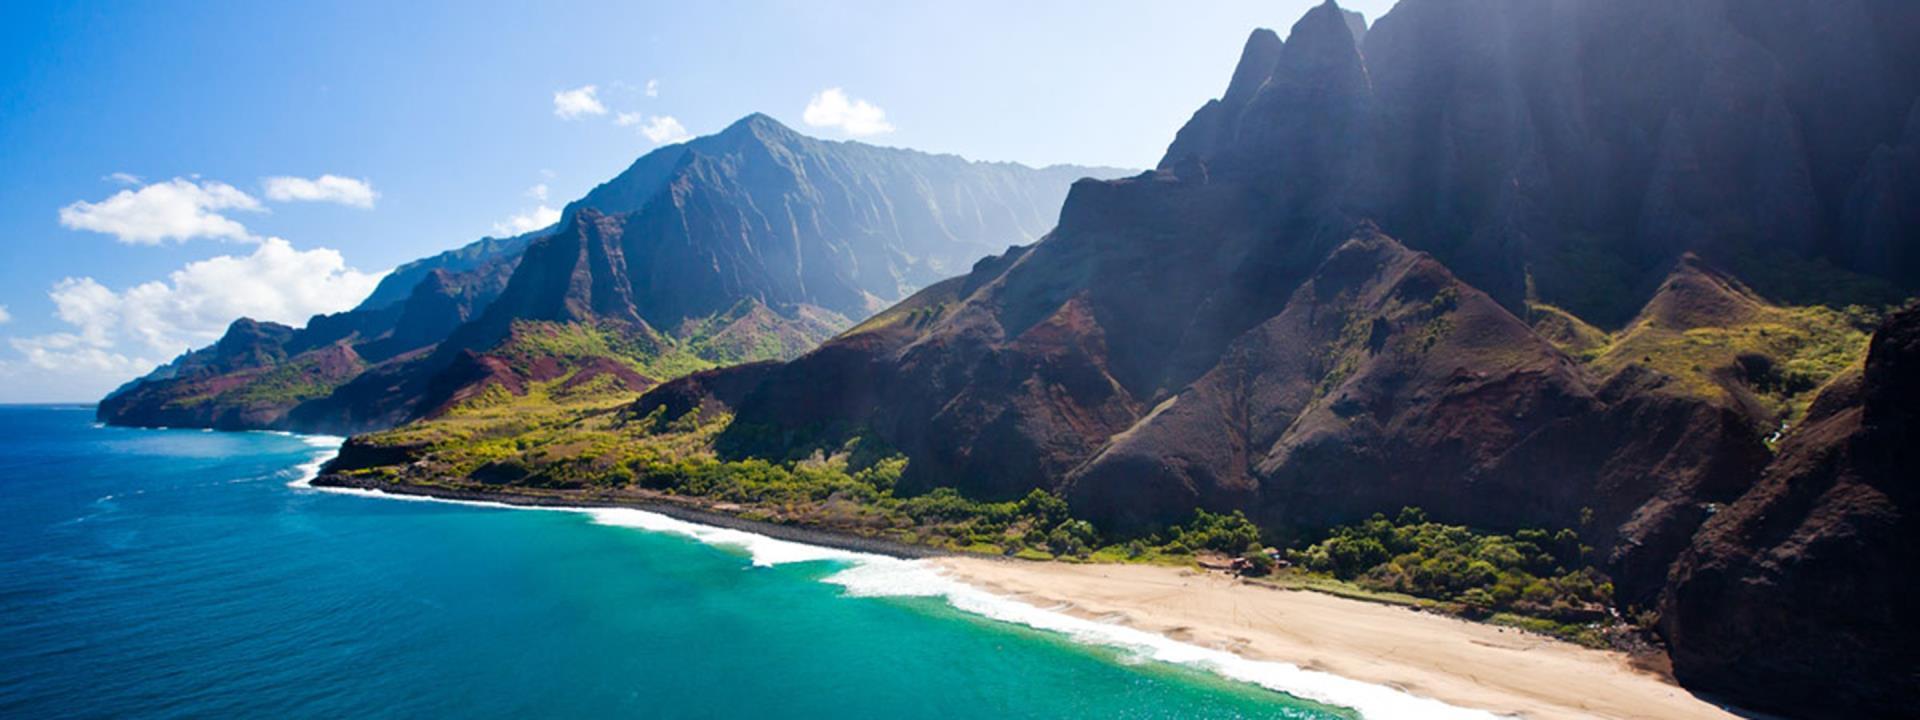 Hours In Kauai Hawaii Furthermore - Landforms in hawaii